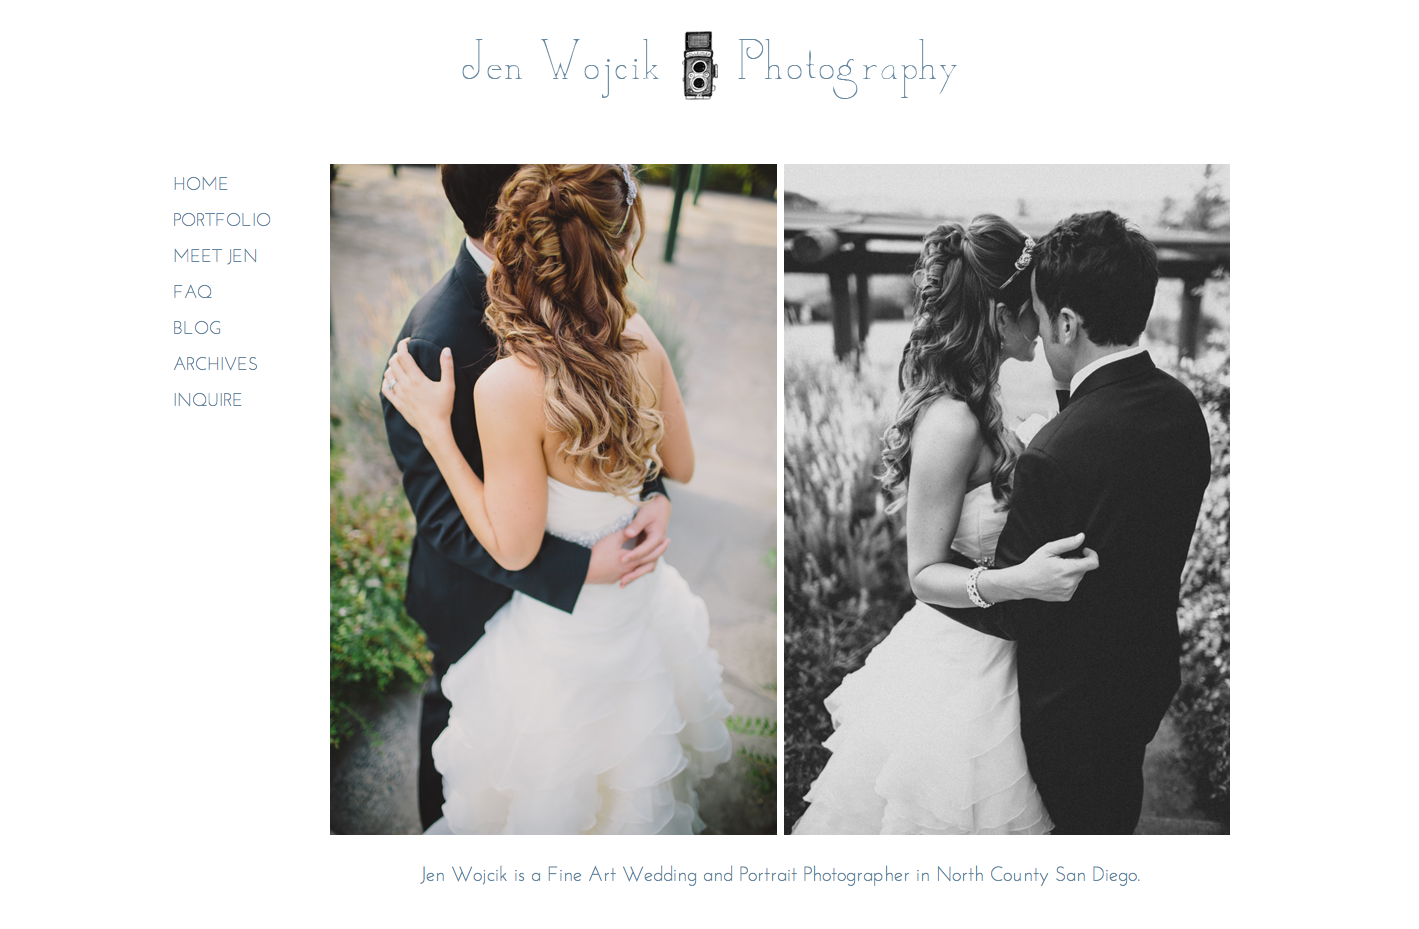 Jen Wojcik Photography - san diego wedding photographer photography